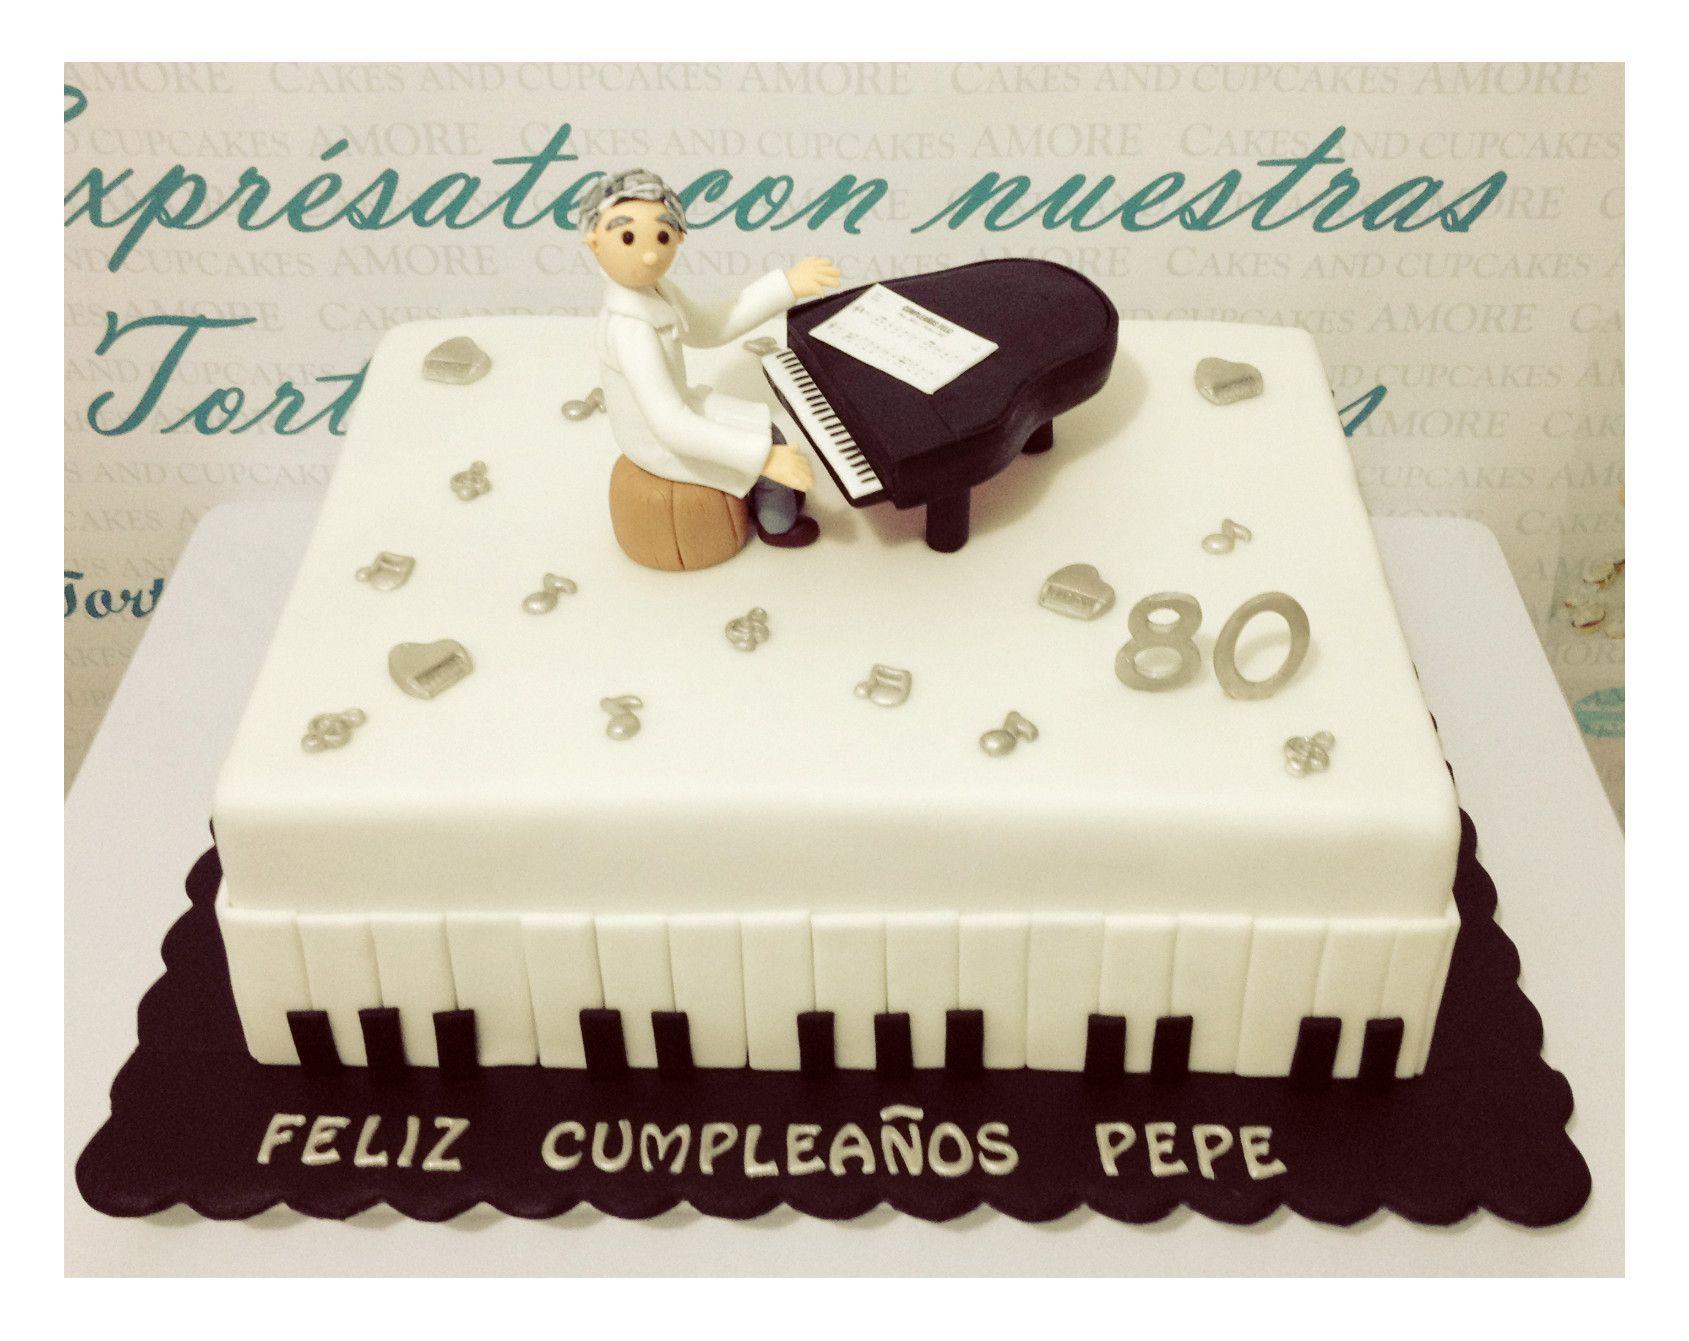 Torta Doctor Pianista | tortas de cumpleaños | Pinterest | Recipes